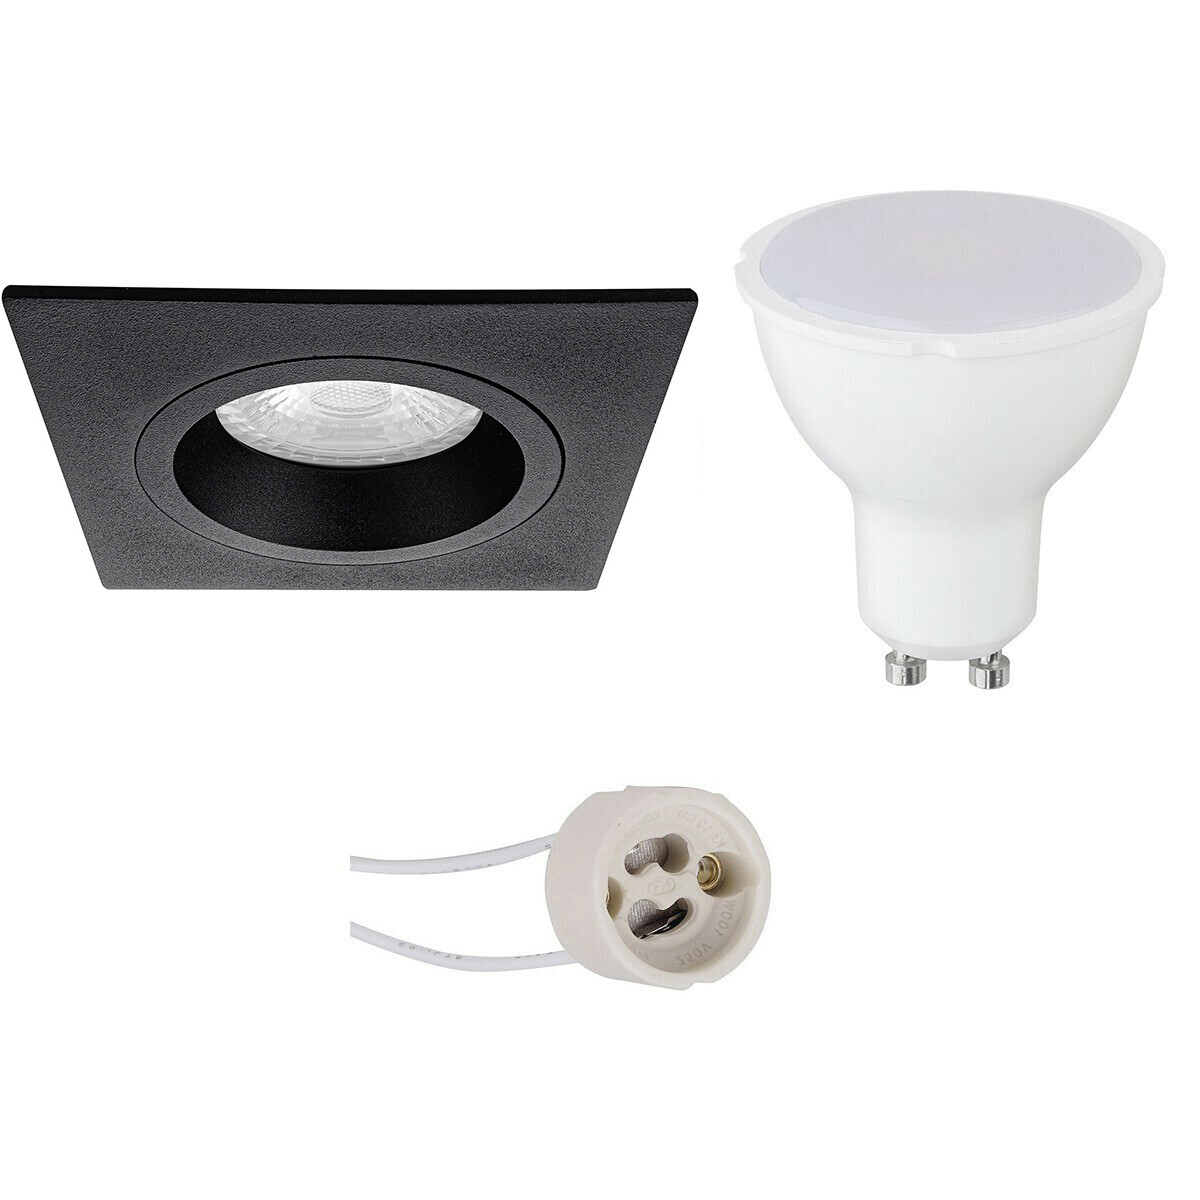 LED Spot Set - Aigi - Pragmi Rodos Pro - GU10 Fitting - Inbouw Vierkant - Mat Zwart - 8W - Helder/Ko